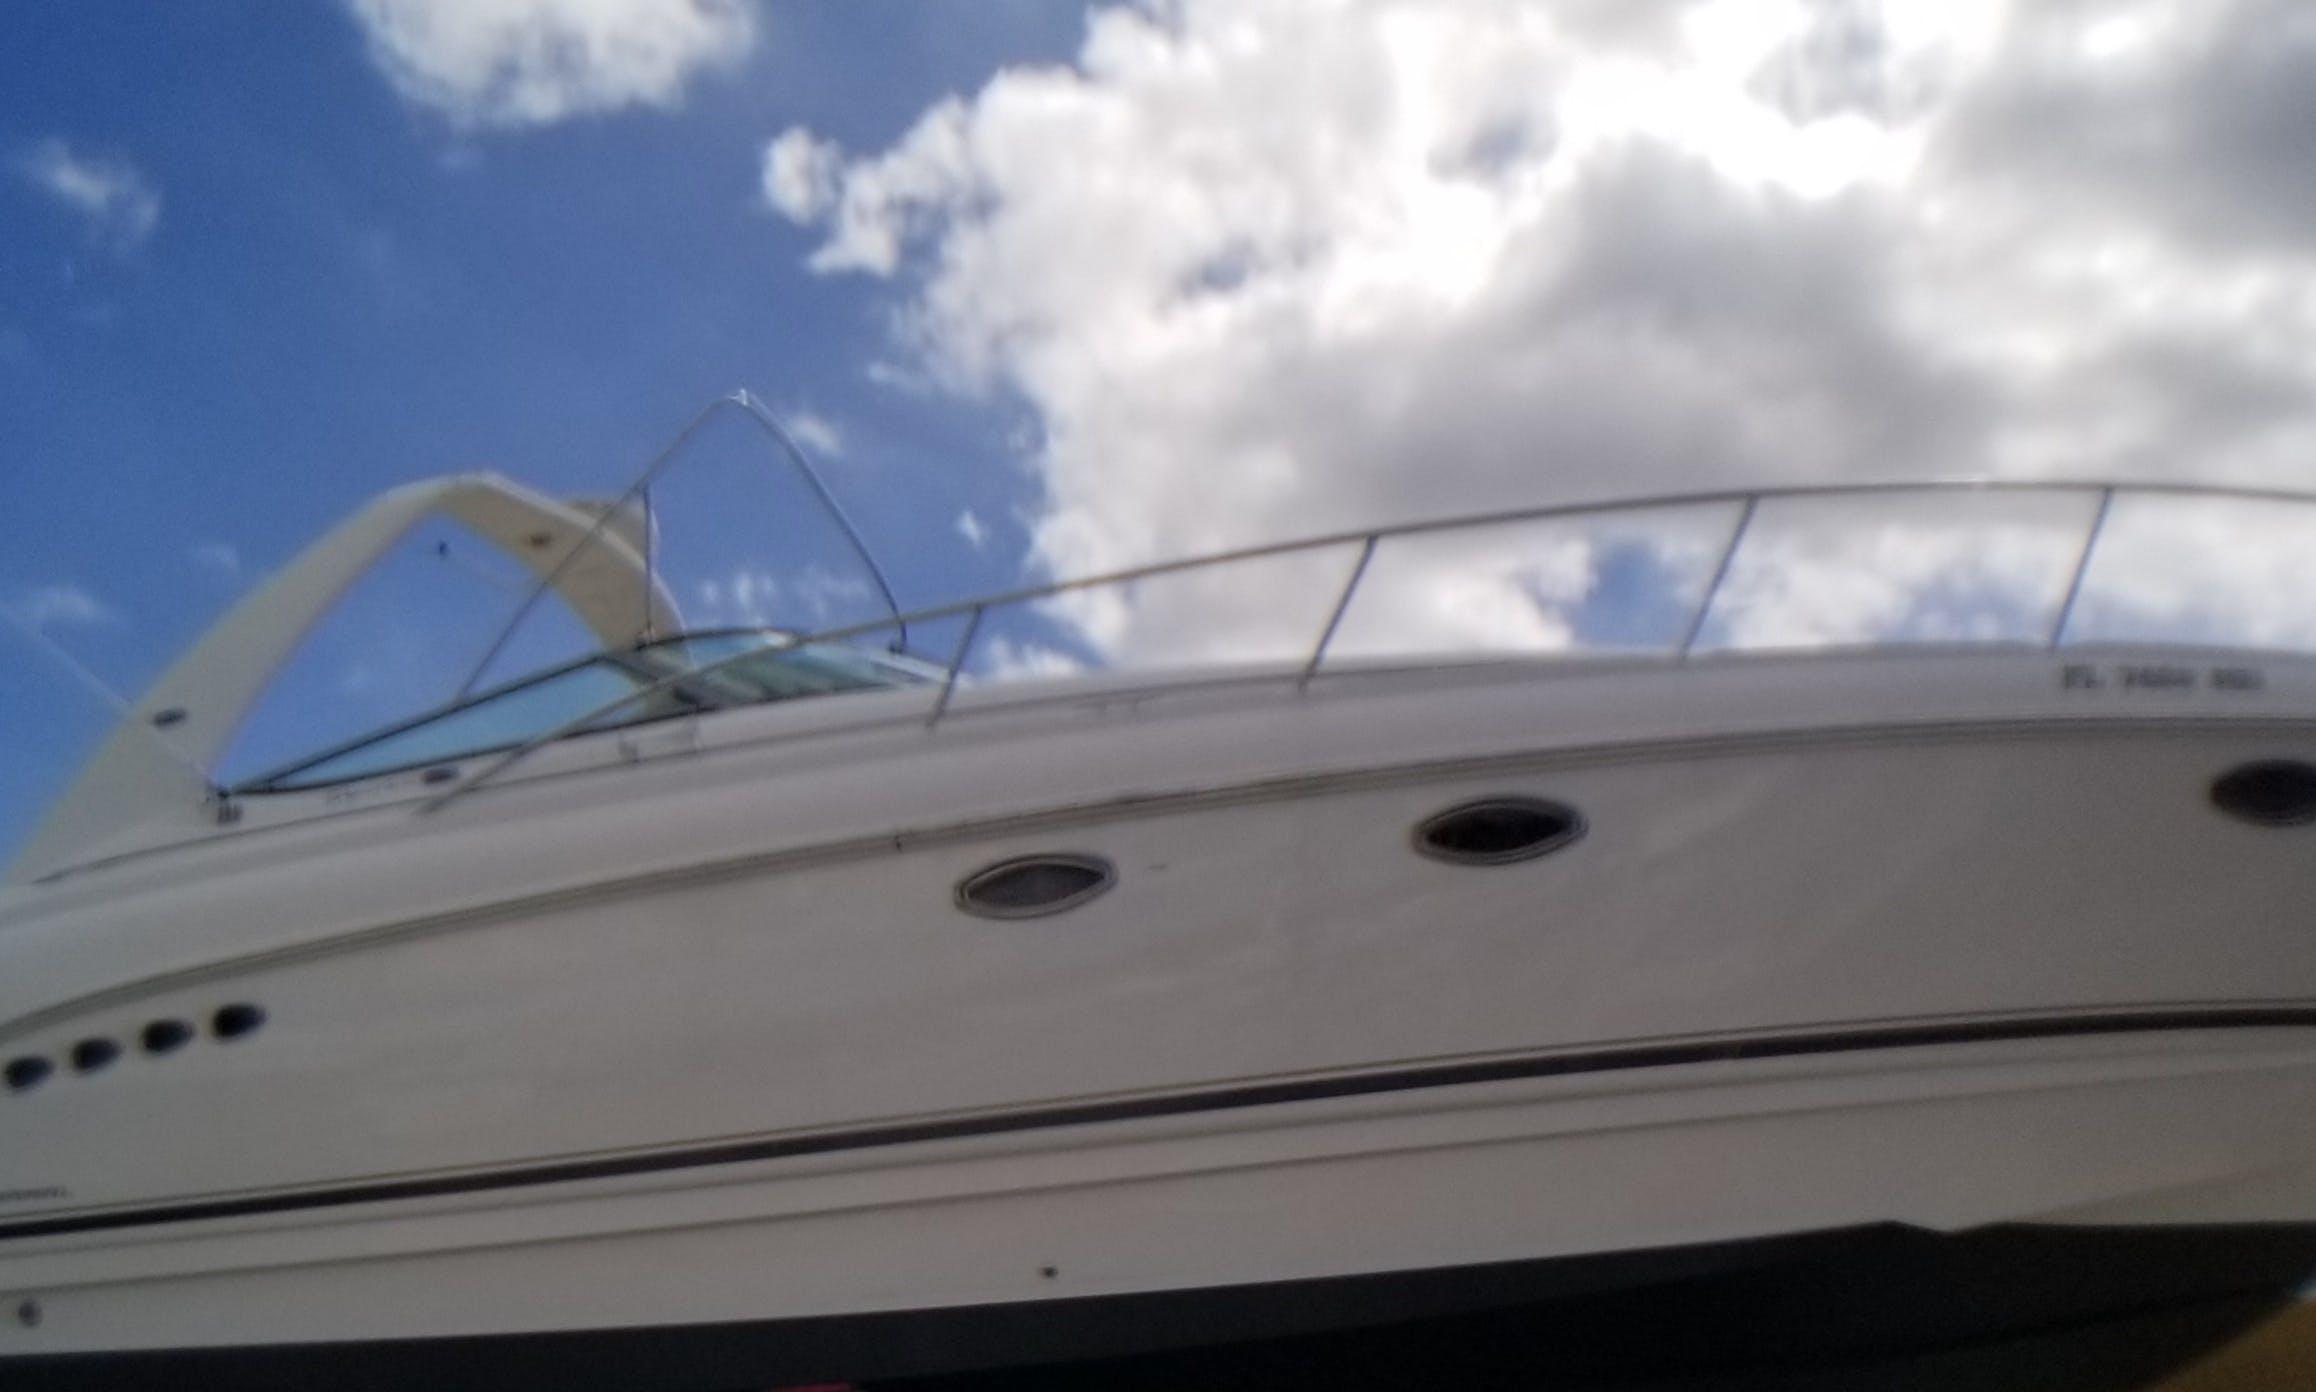 Pristine European Inspired 40' Yacht - Let's Go!